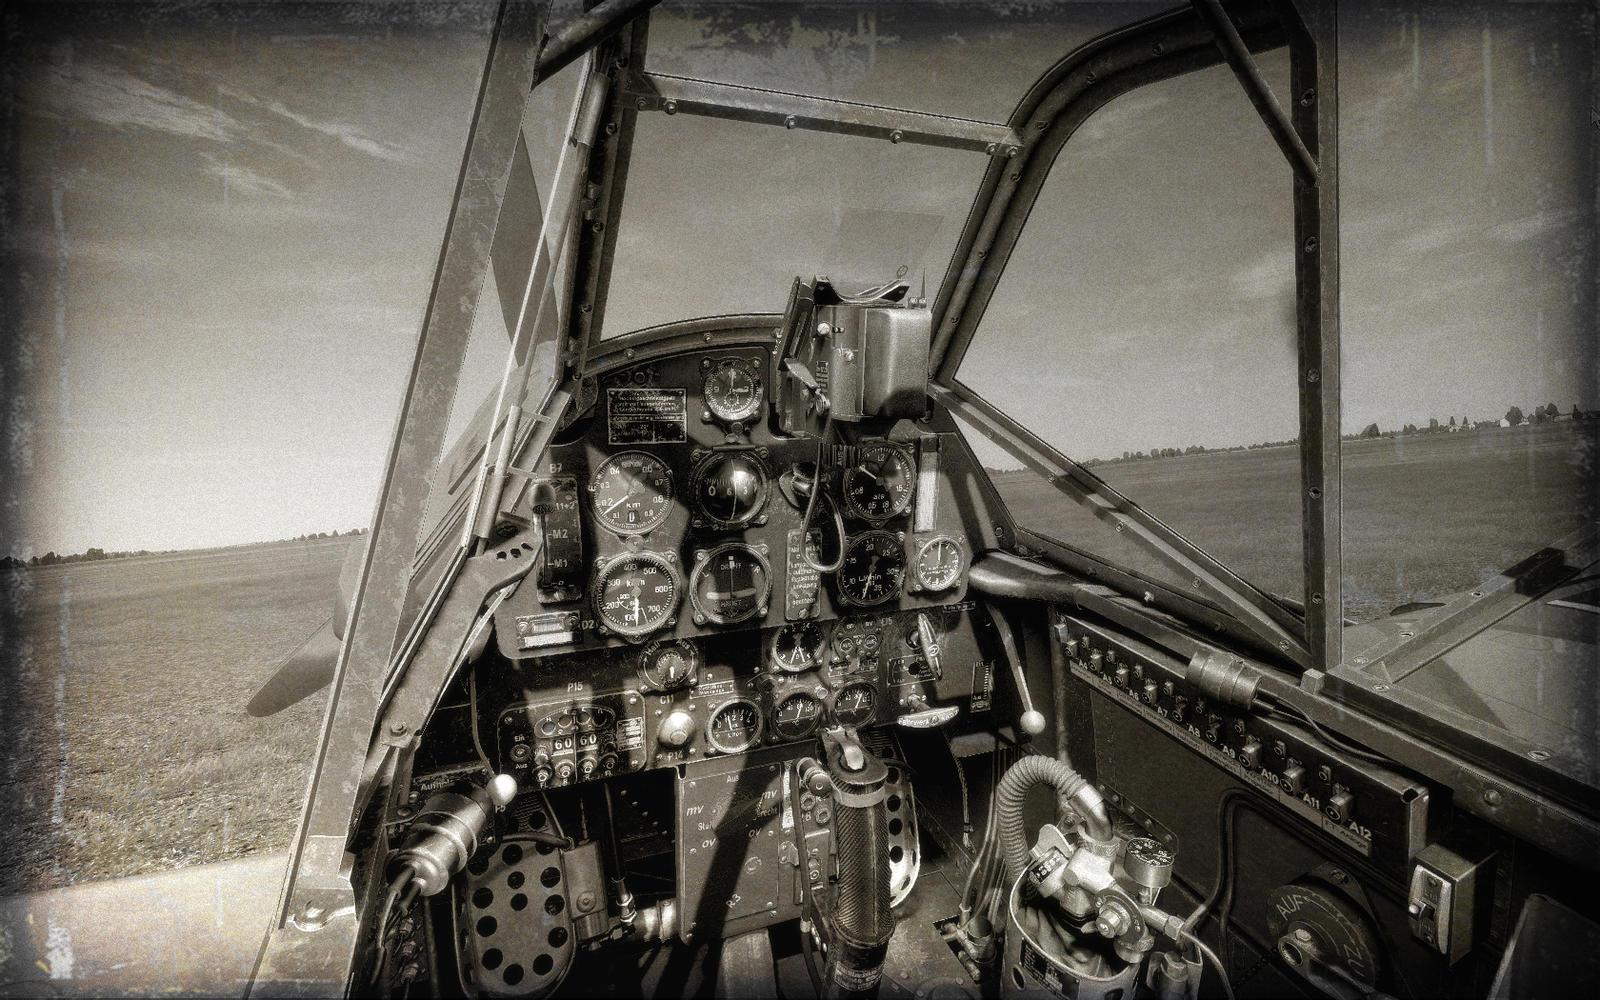 109E4B Cockpit by TarJakArt